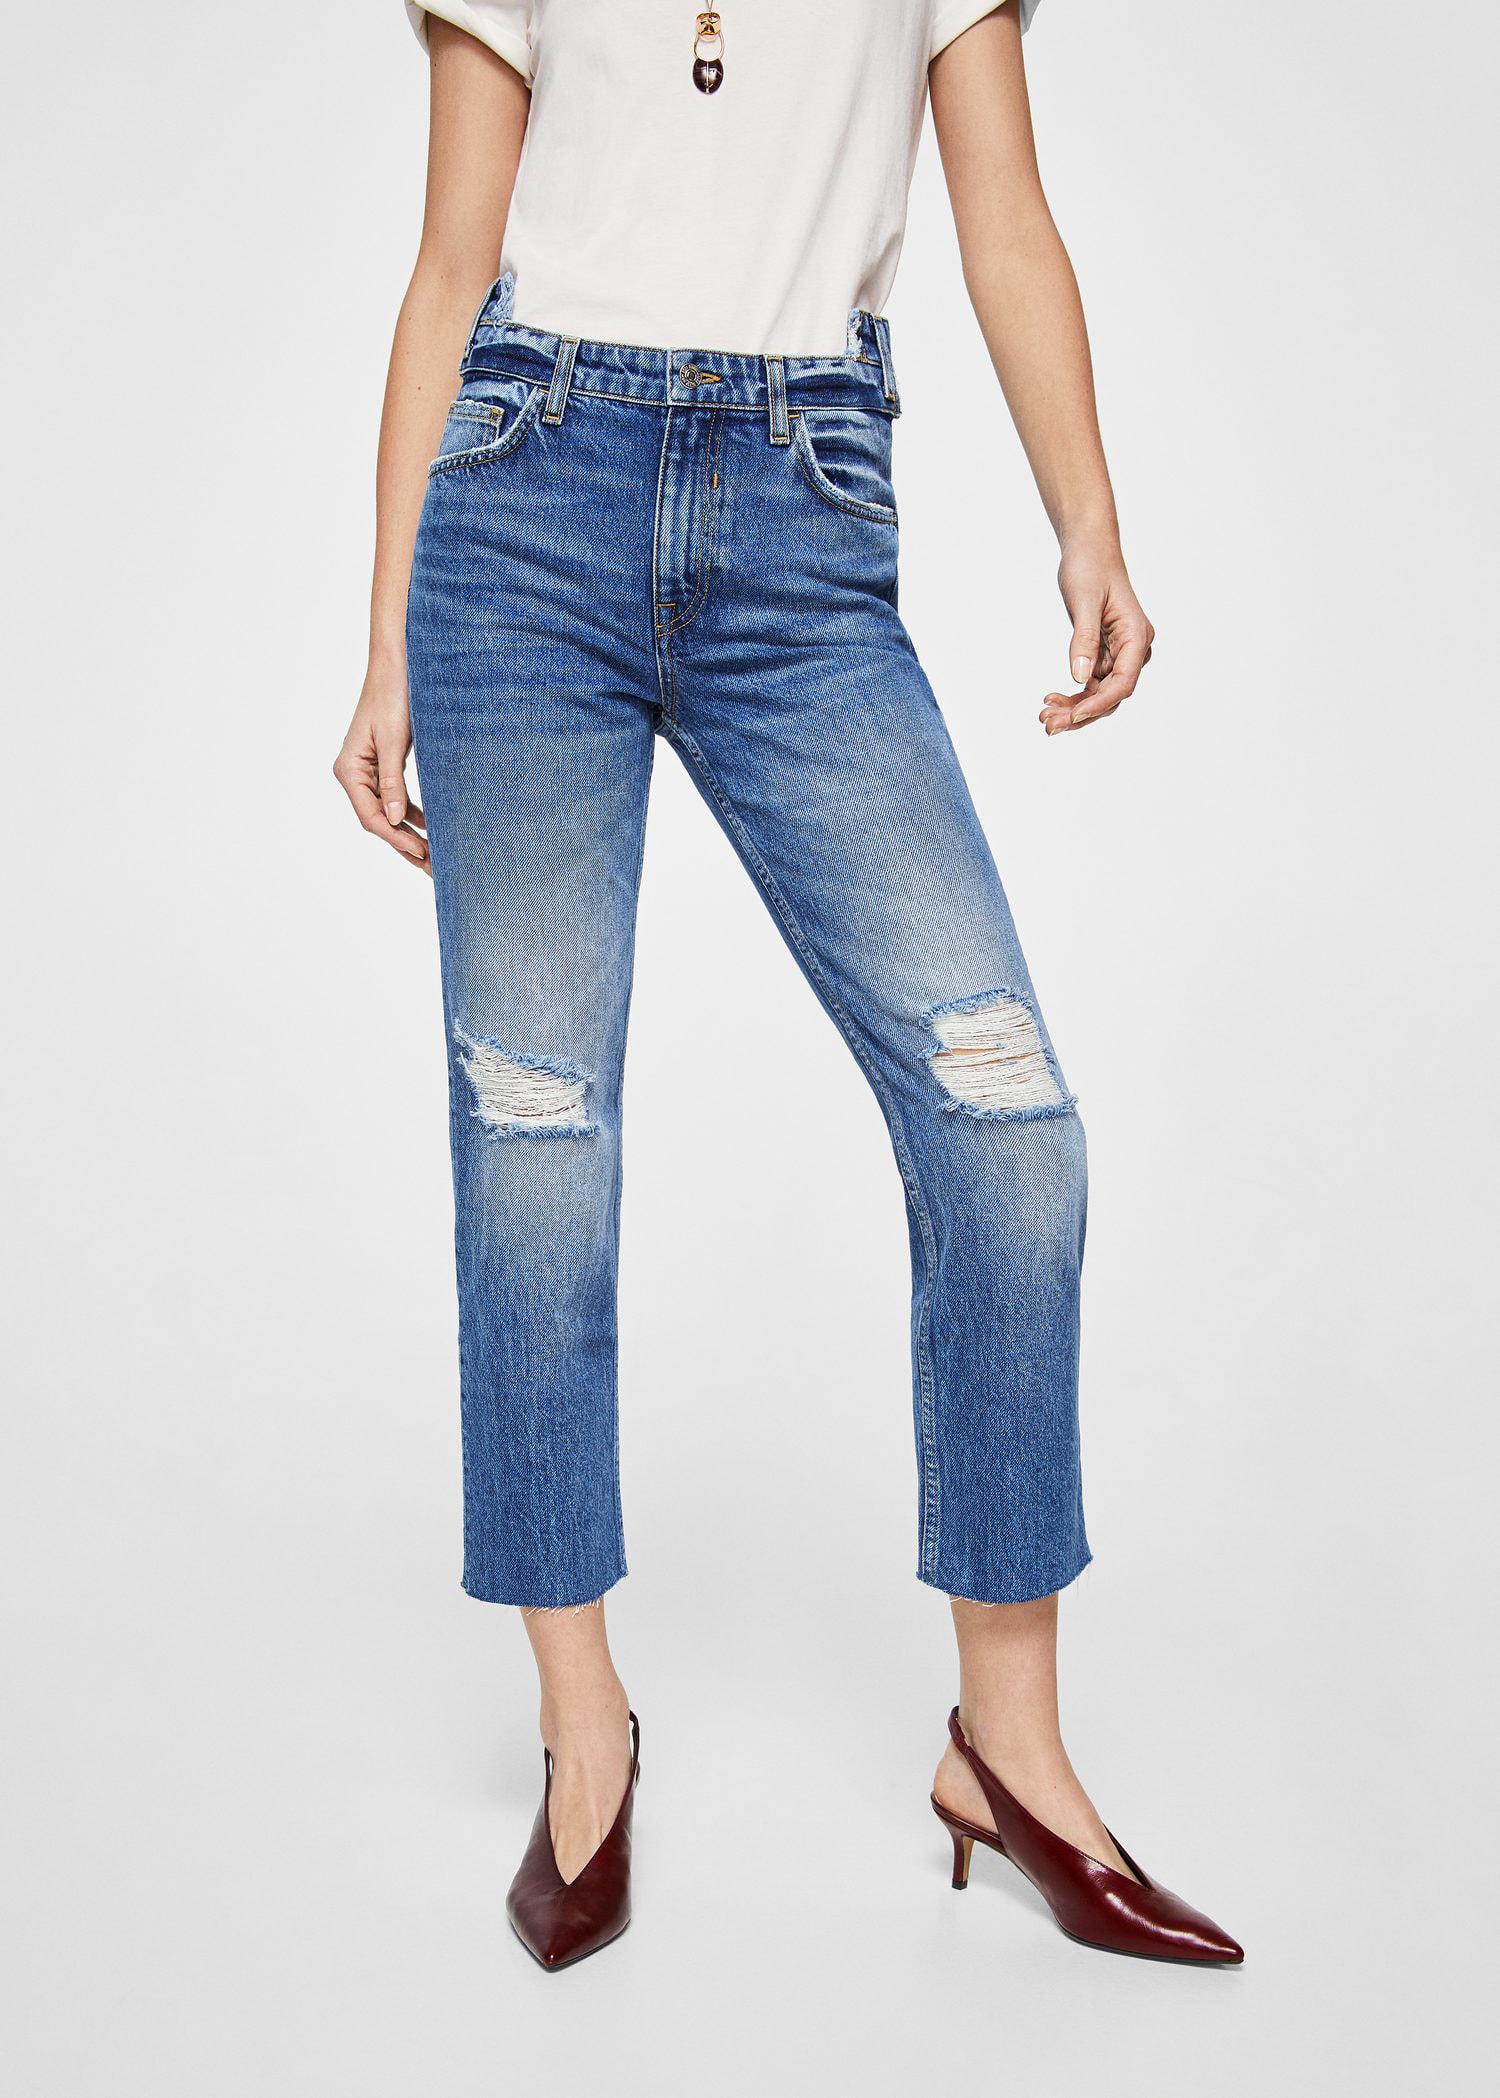 frayed hem straight leg jeans in blue - Blue Mango orcGx